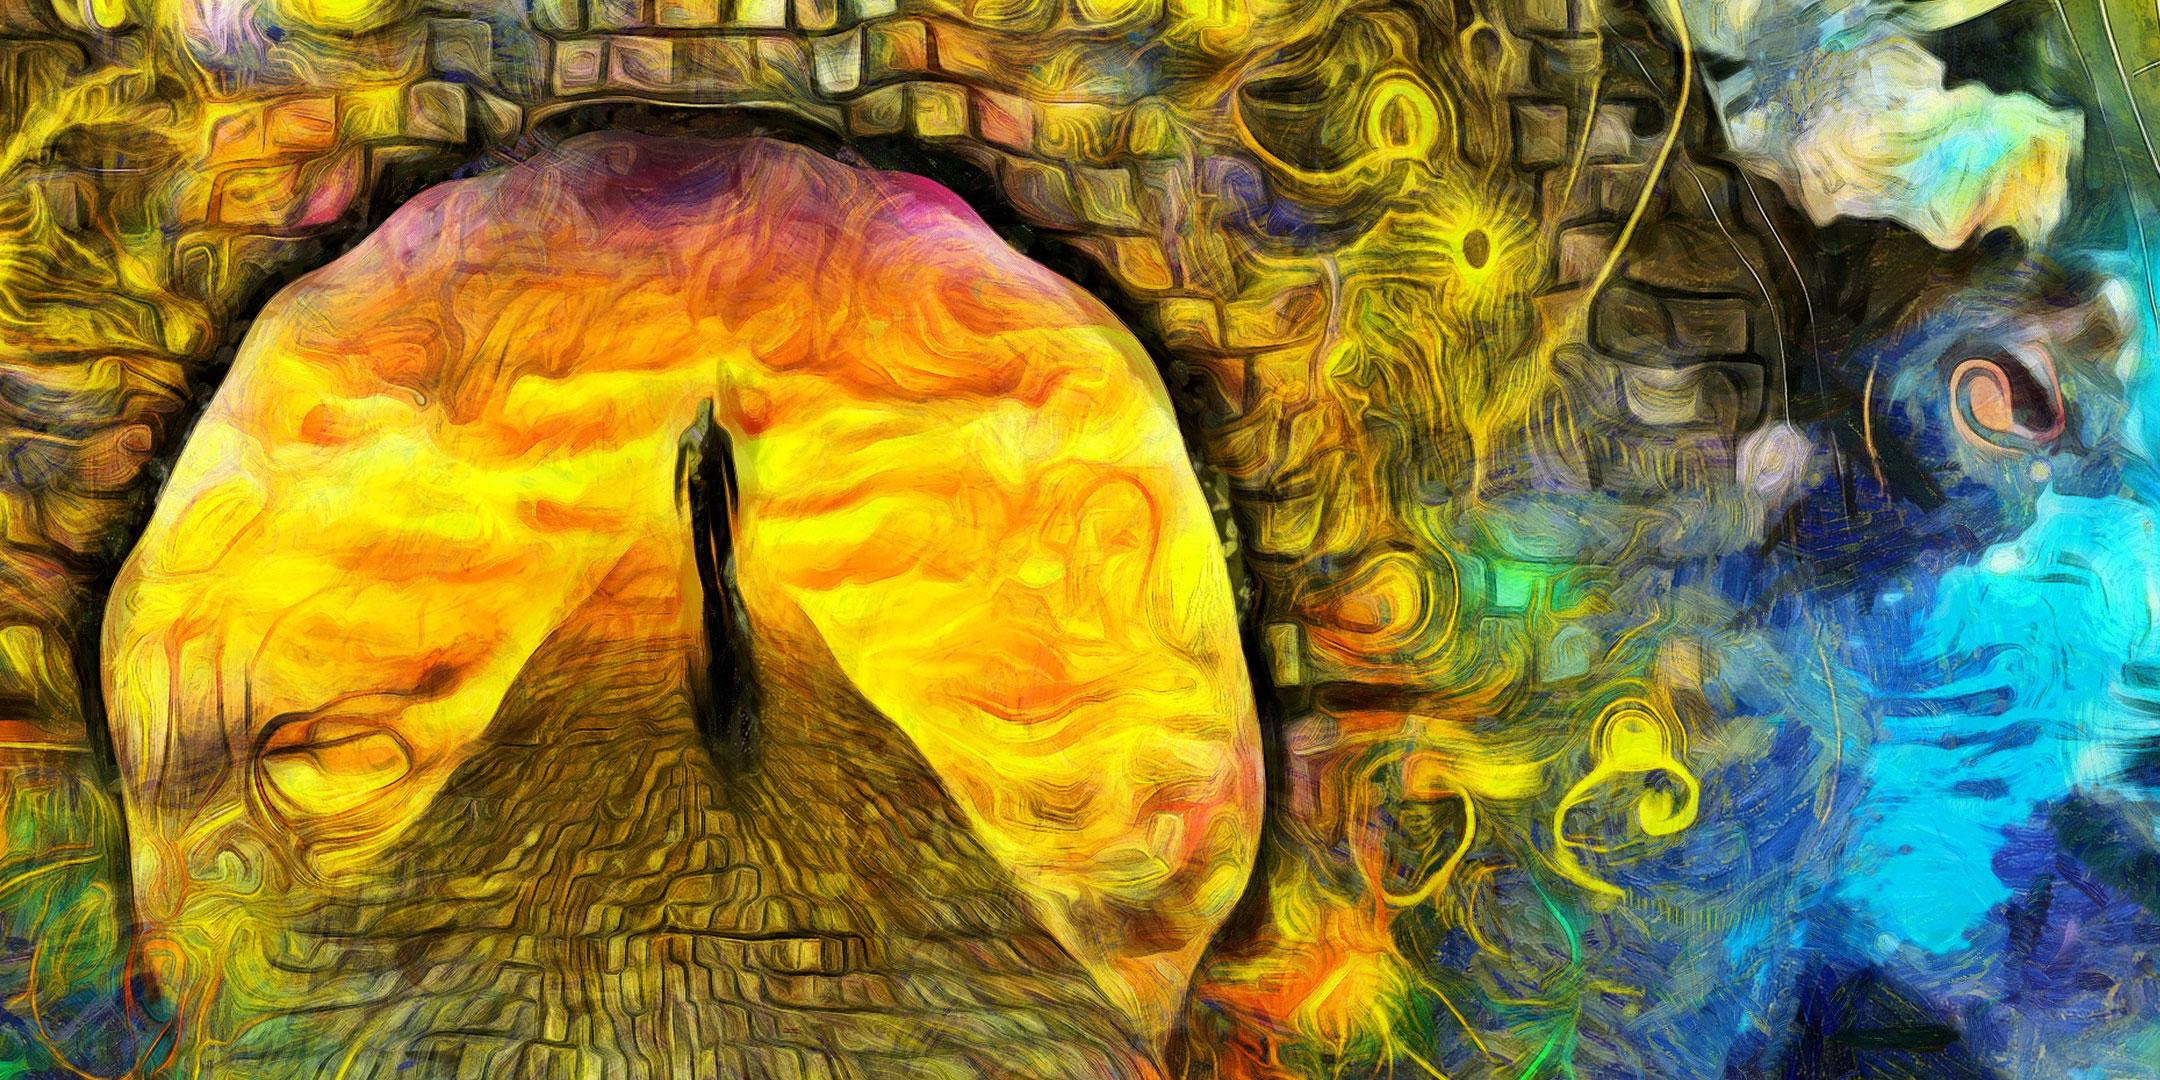 shmanic-journey-new.jpg